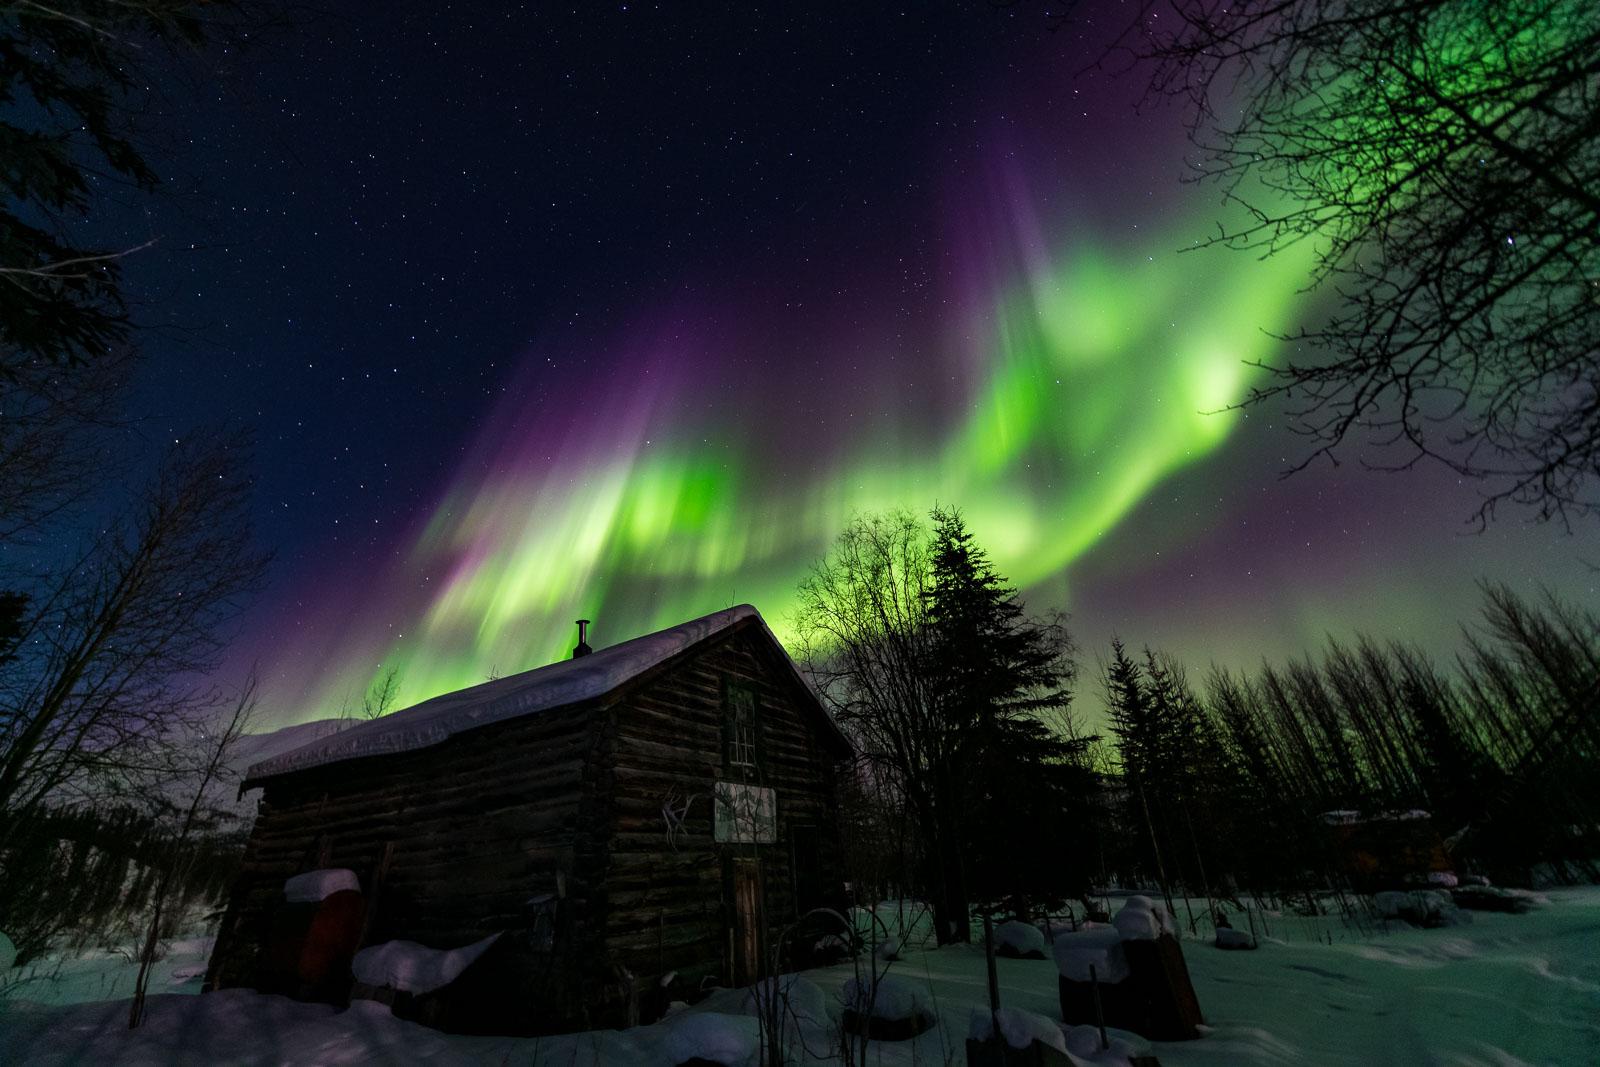 The aurora borealis soars over the historic General Store in Wiseman, Alaska.